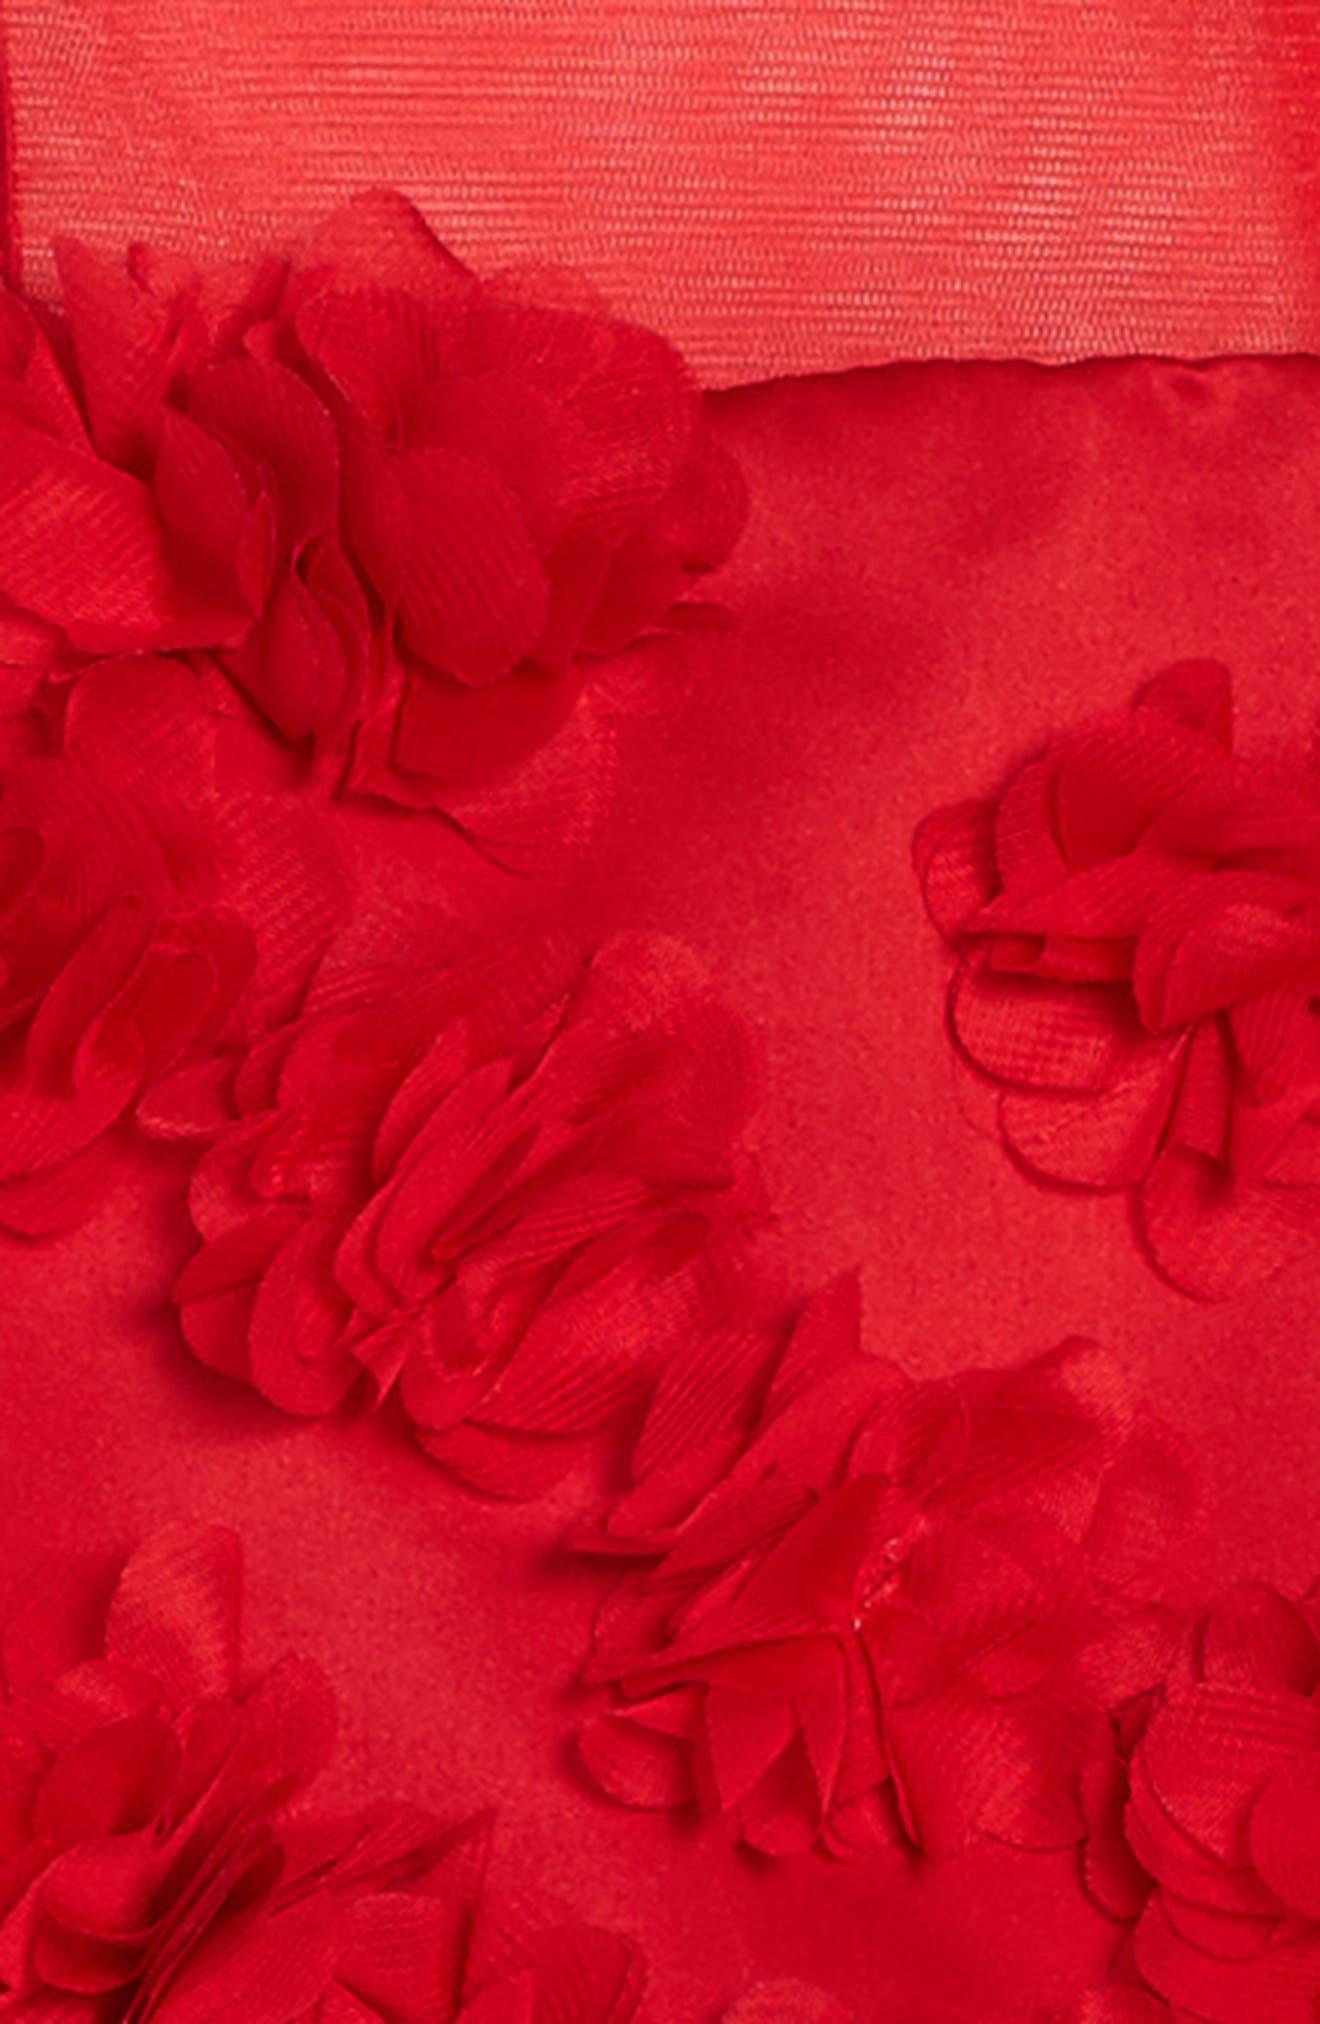 Floral Embellished Sleeveless Dress,                             Alternate thumbnail 3, color,                             610